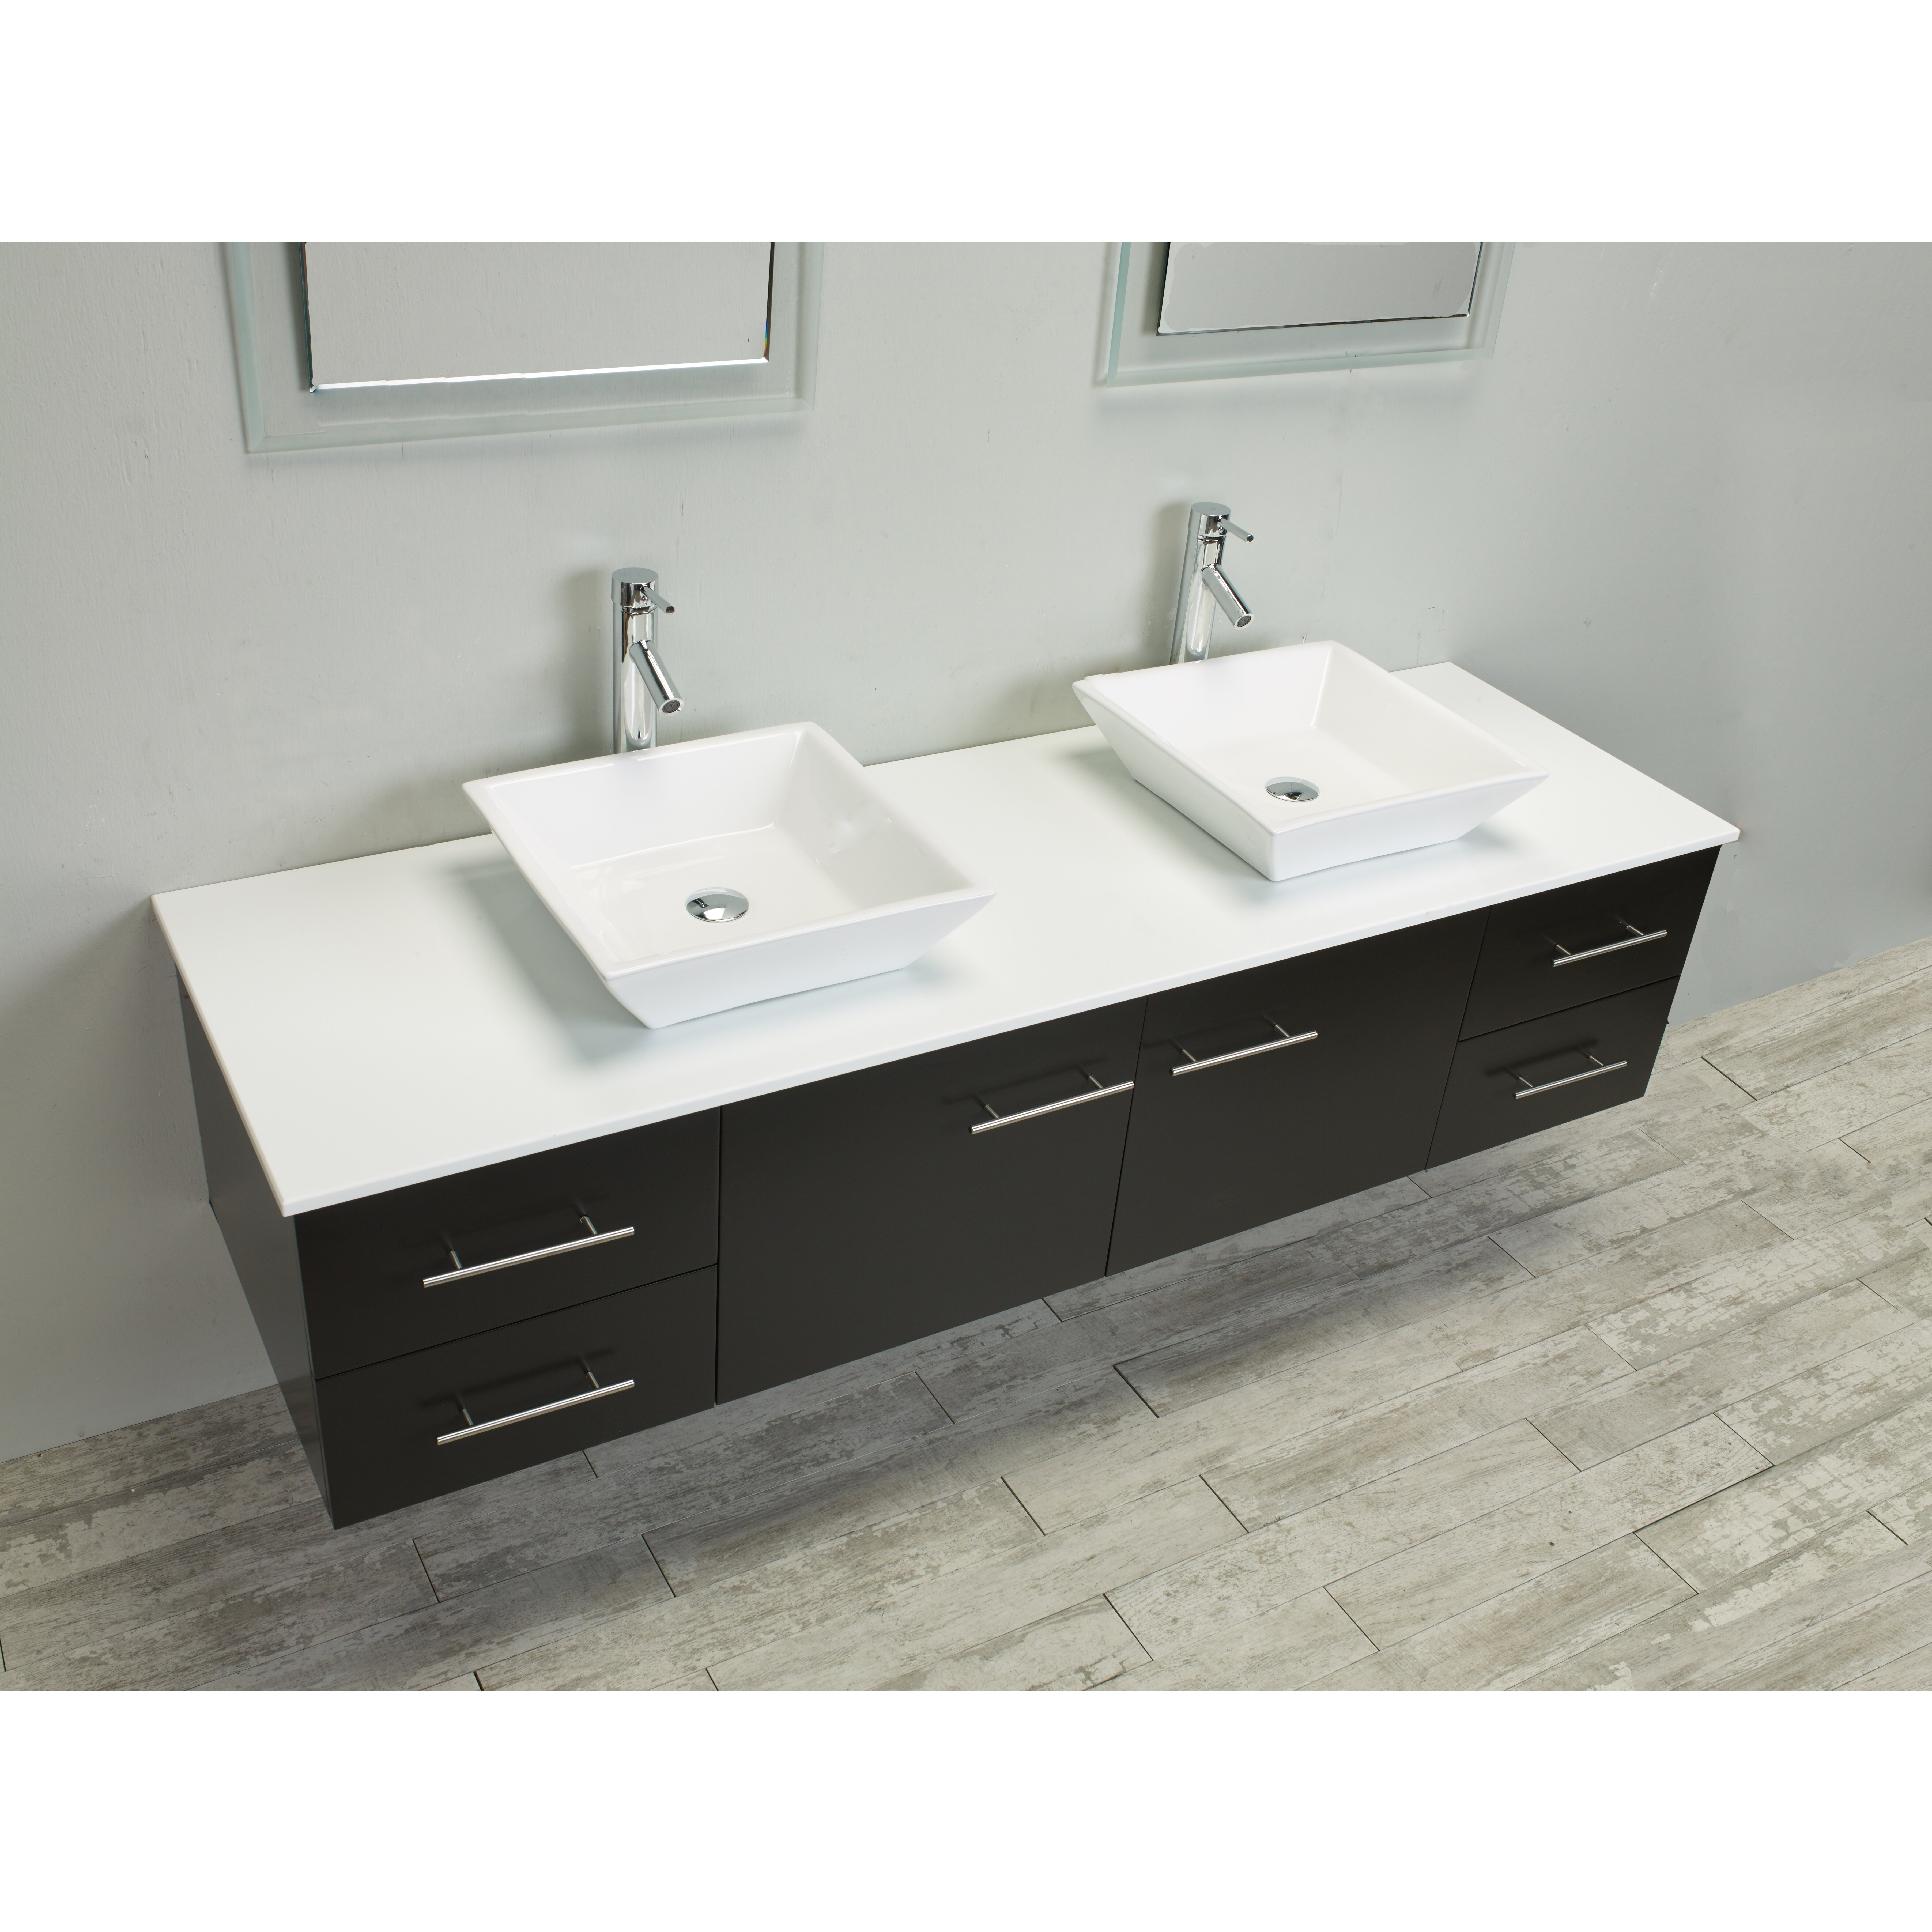 Eviva Totti Wave 72 Double Sink Espresso Modern Bathroom Vanity Set W